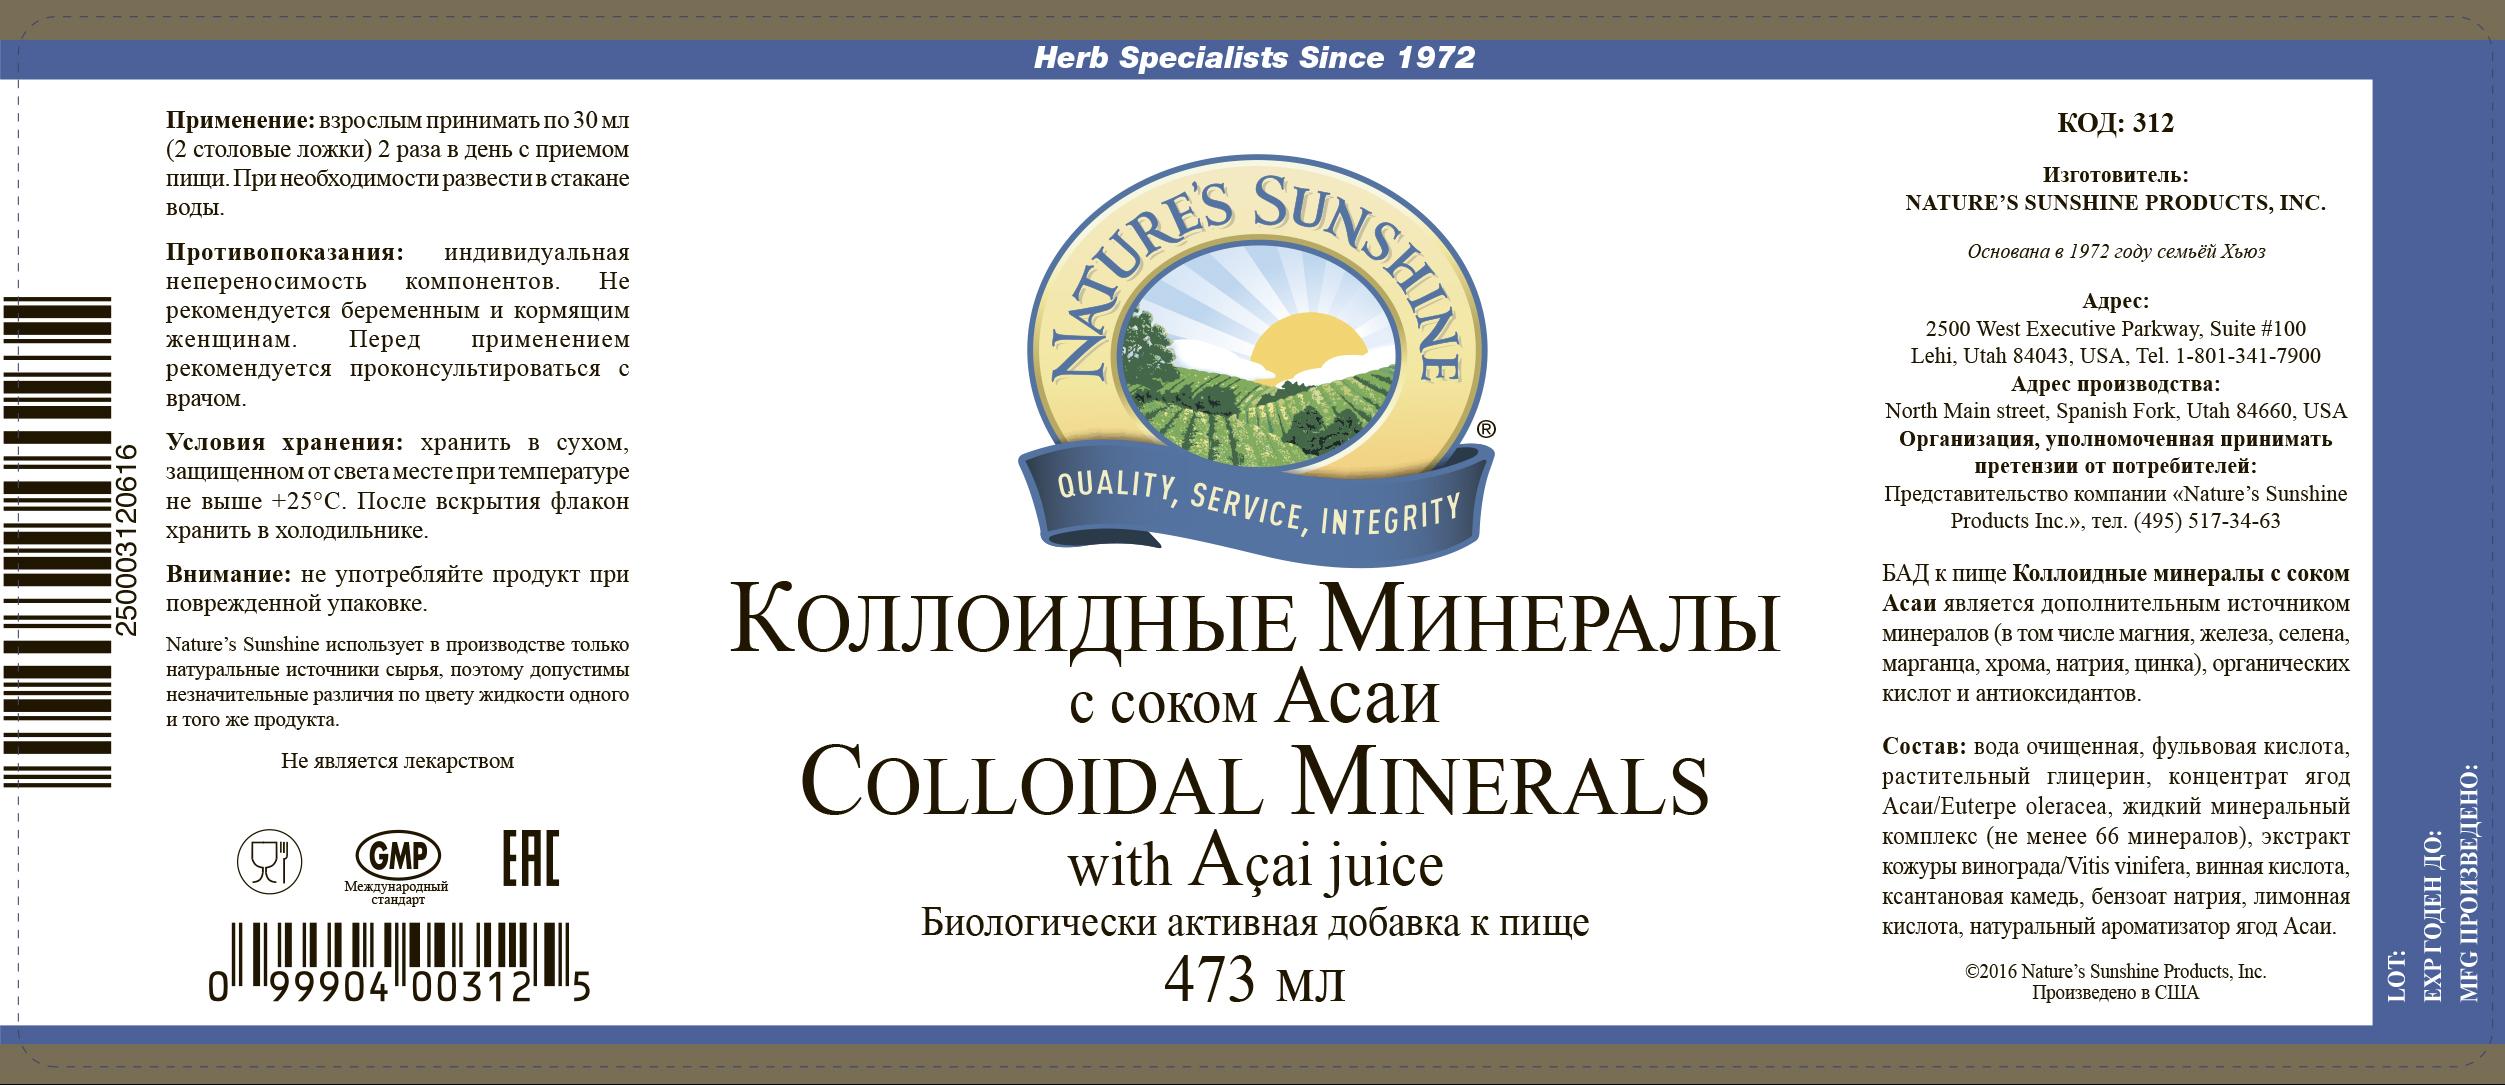 Картинка Коллоидные минералы с соком Асаи / Colloidal Minerals with Acai Juice от магазина Nature's Sunshine Products